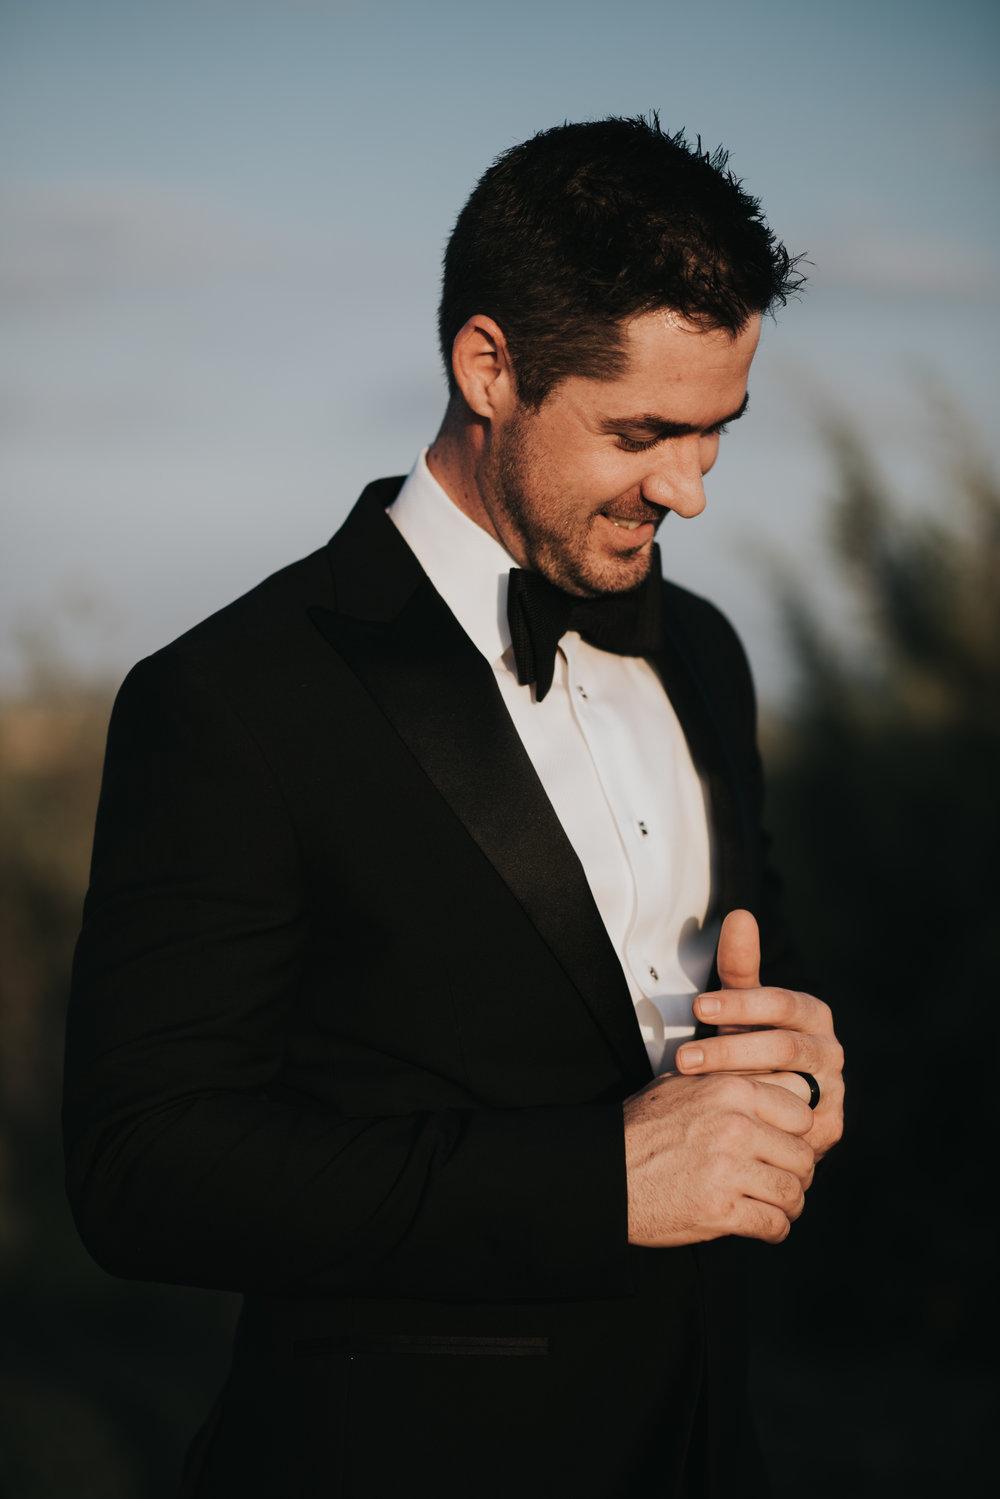 charleston-wedding-photographers-19.jpg